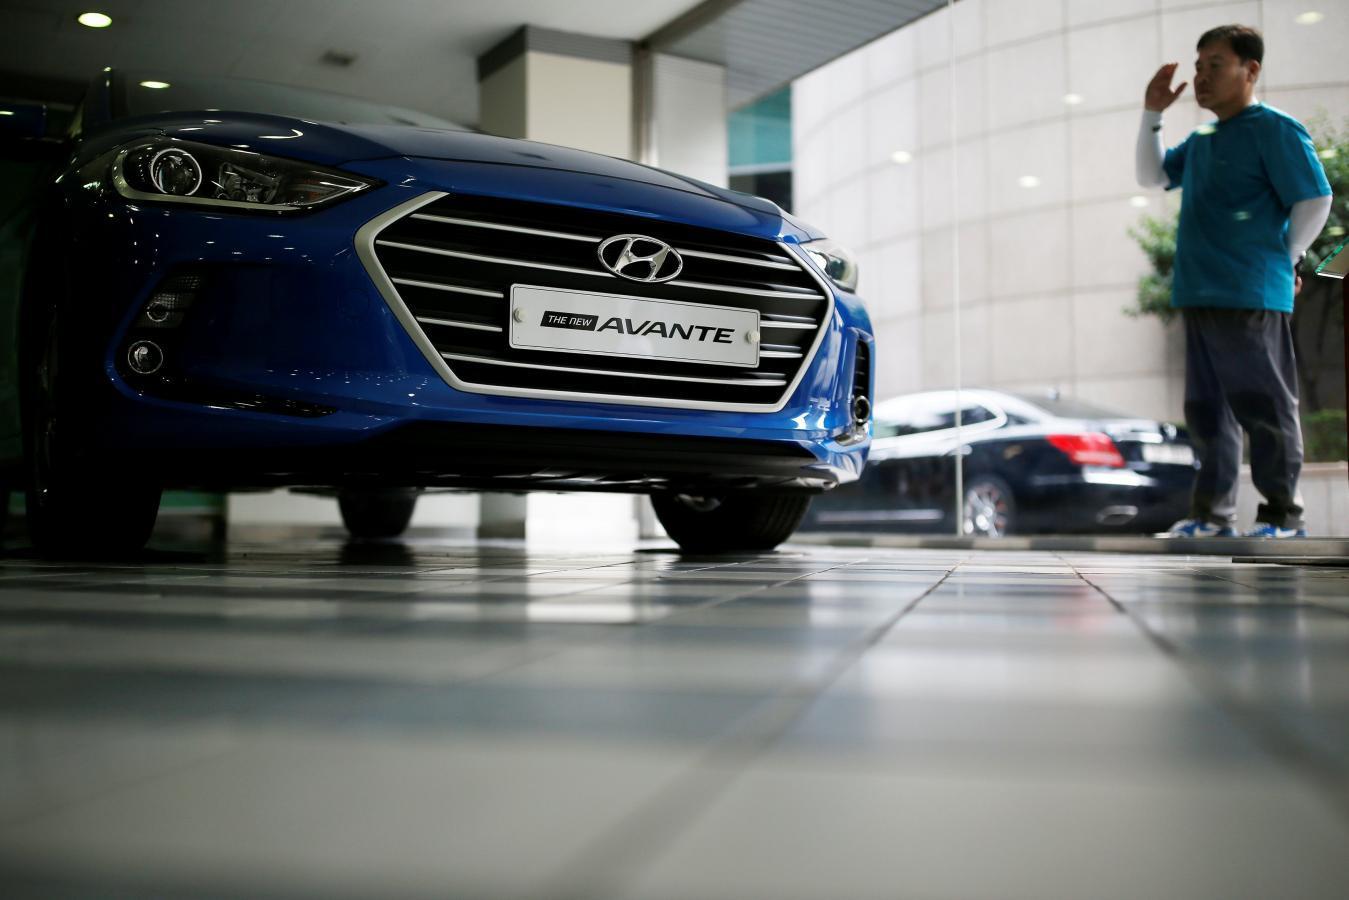 Losing the X-factor: Hyundai fumbles in U S  as former hit